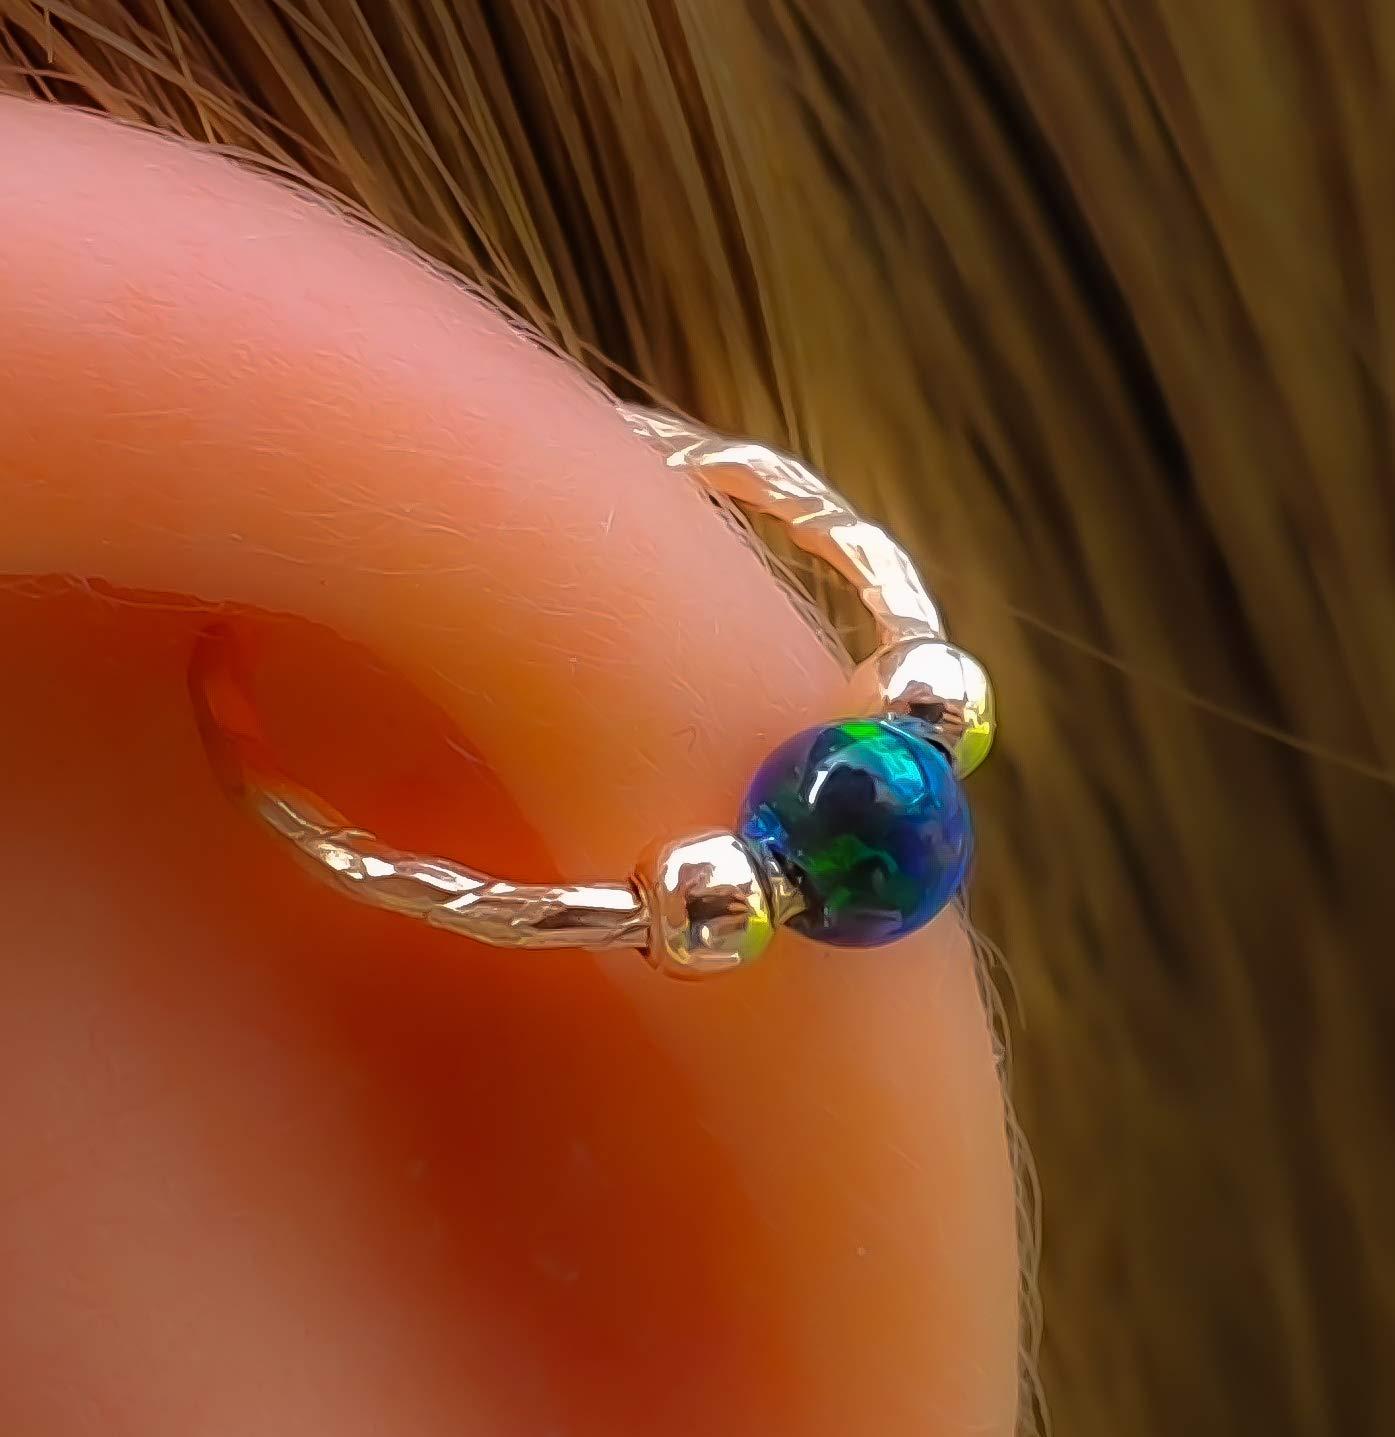 Opal Cartilage Earring Industry No. 1 Hoop - Filled 14k 20 Gauge Gold Finally resale start